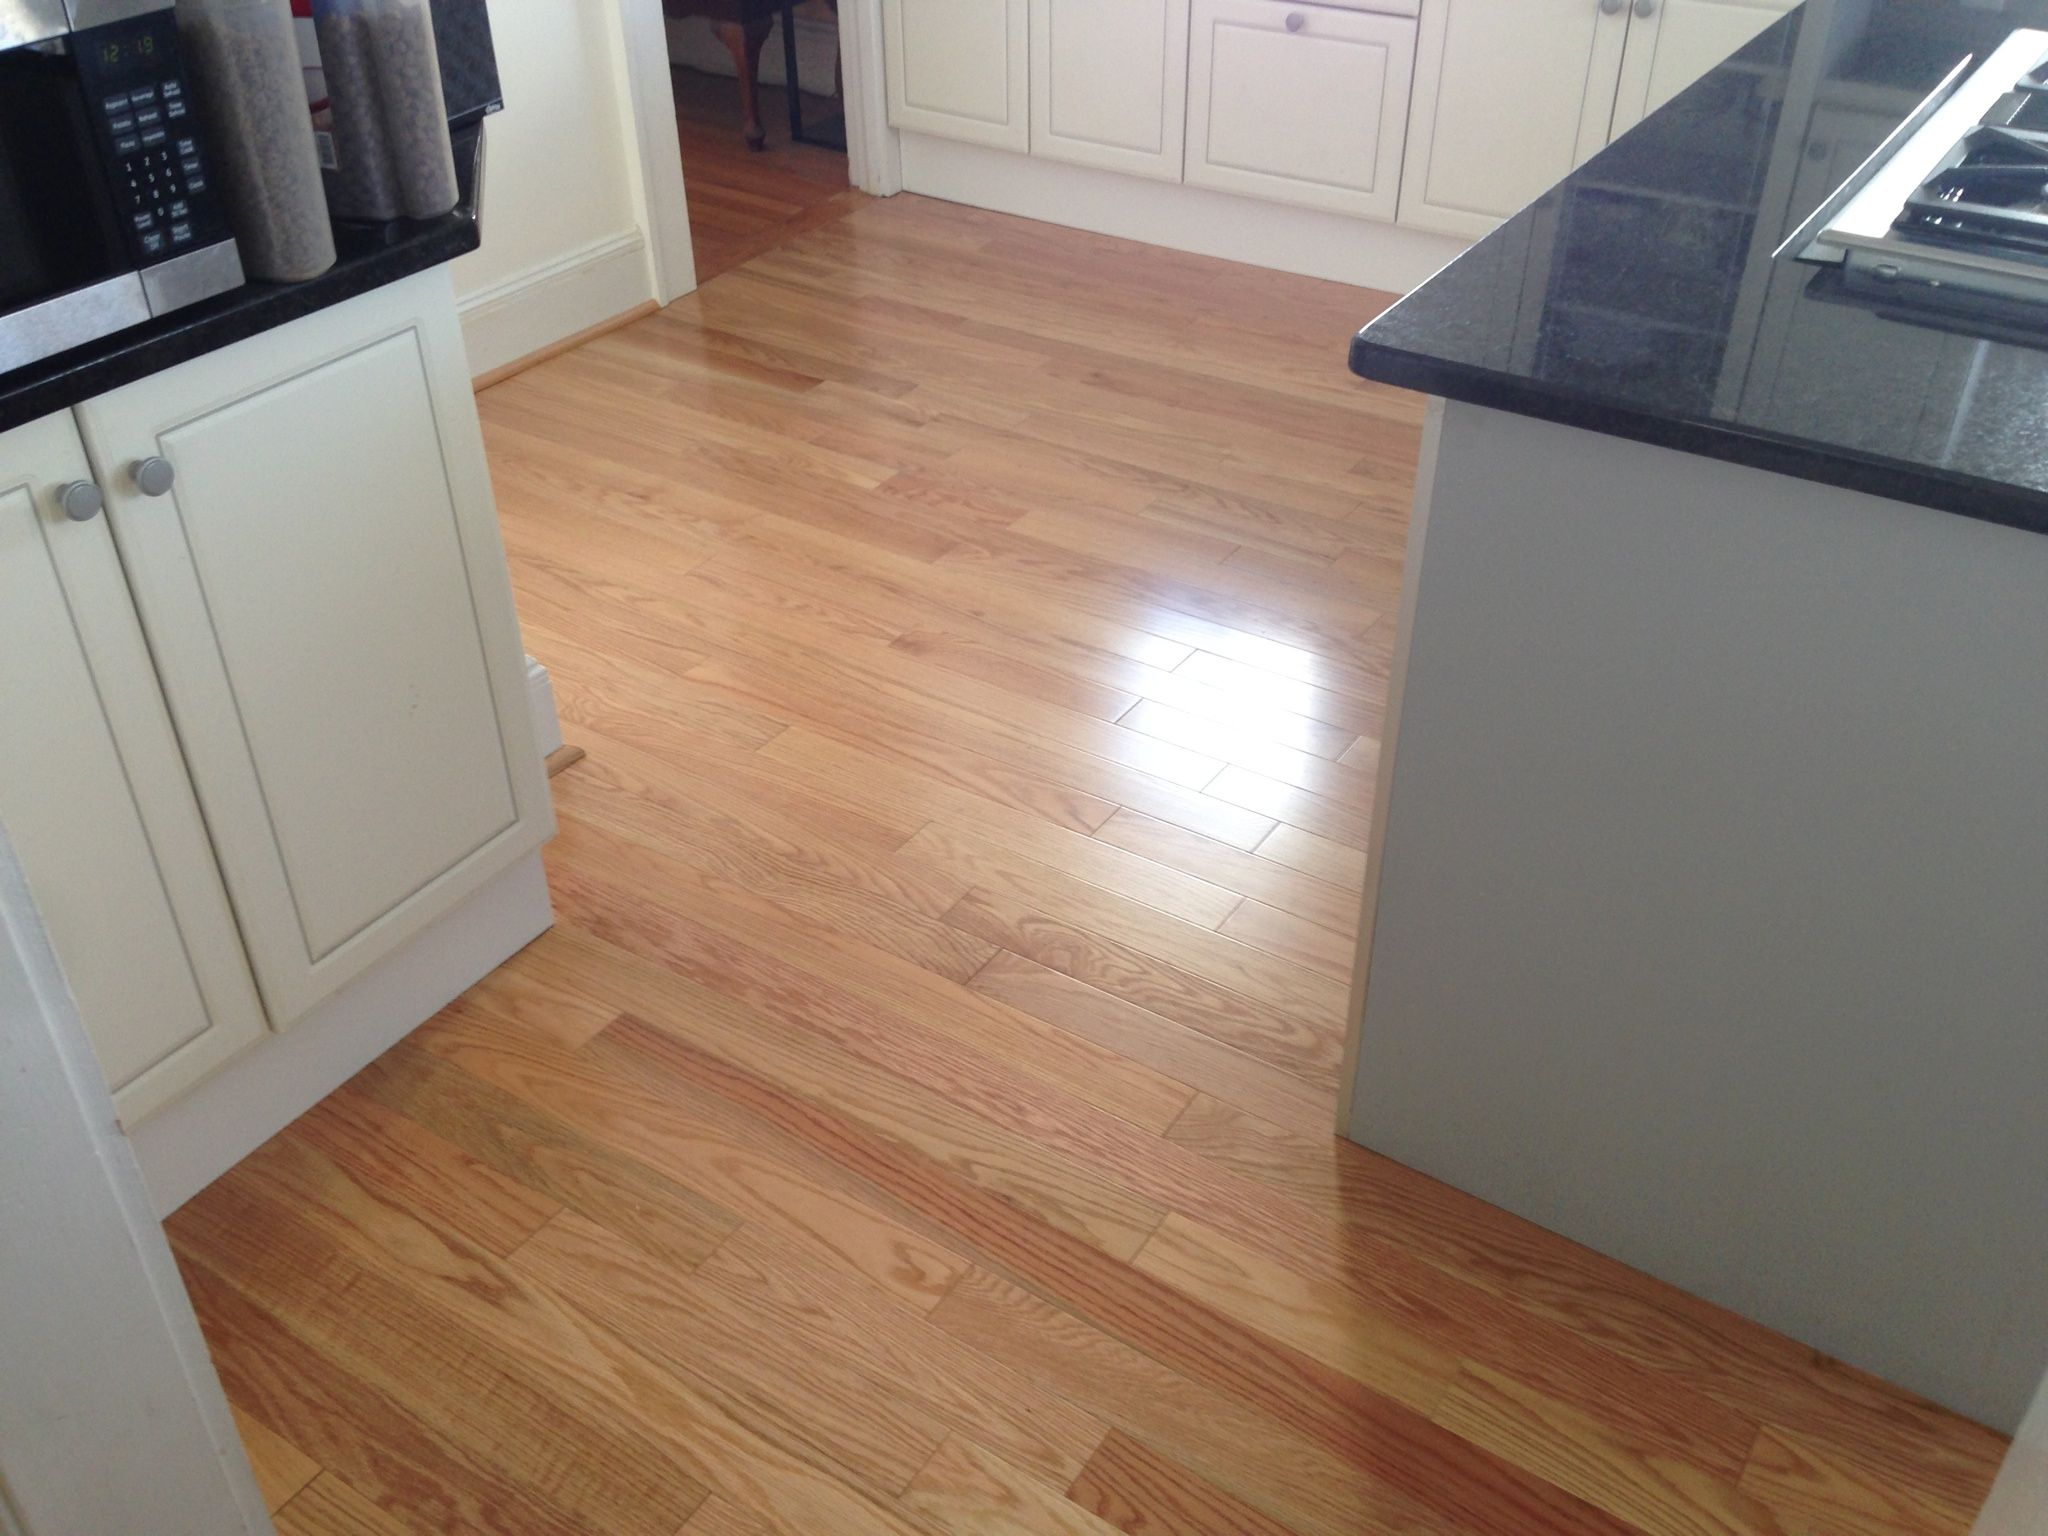 3 1 4 Somerset Color Plank Engineered Red Oak Natural Hardwood Installed In A Kitchen Hardwood Floors Floor Colors Home Remodeling